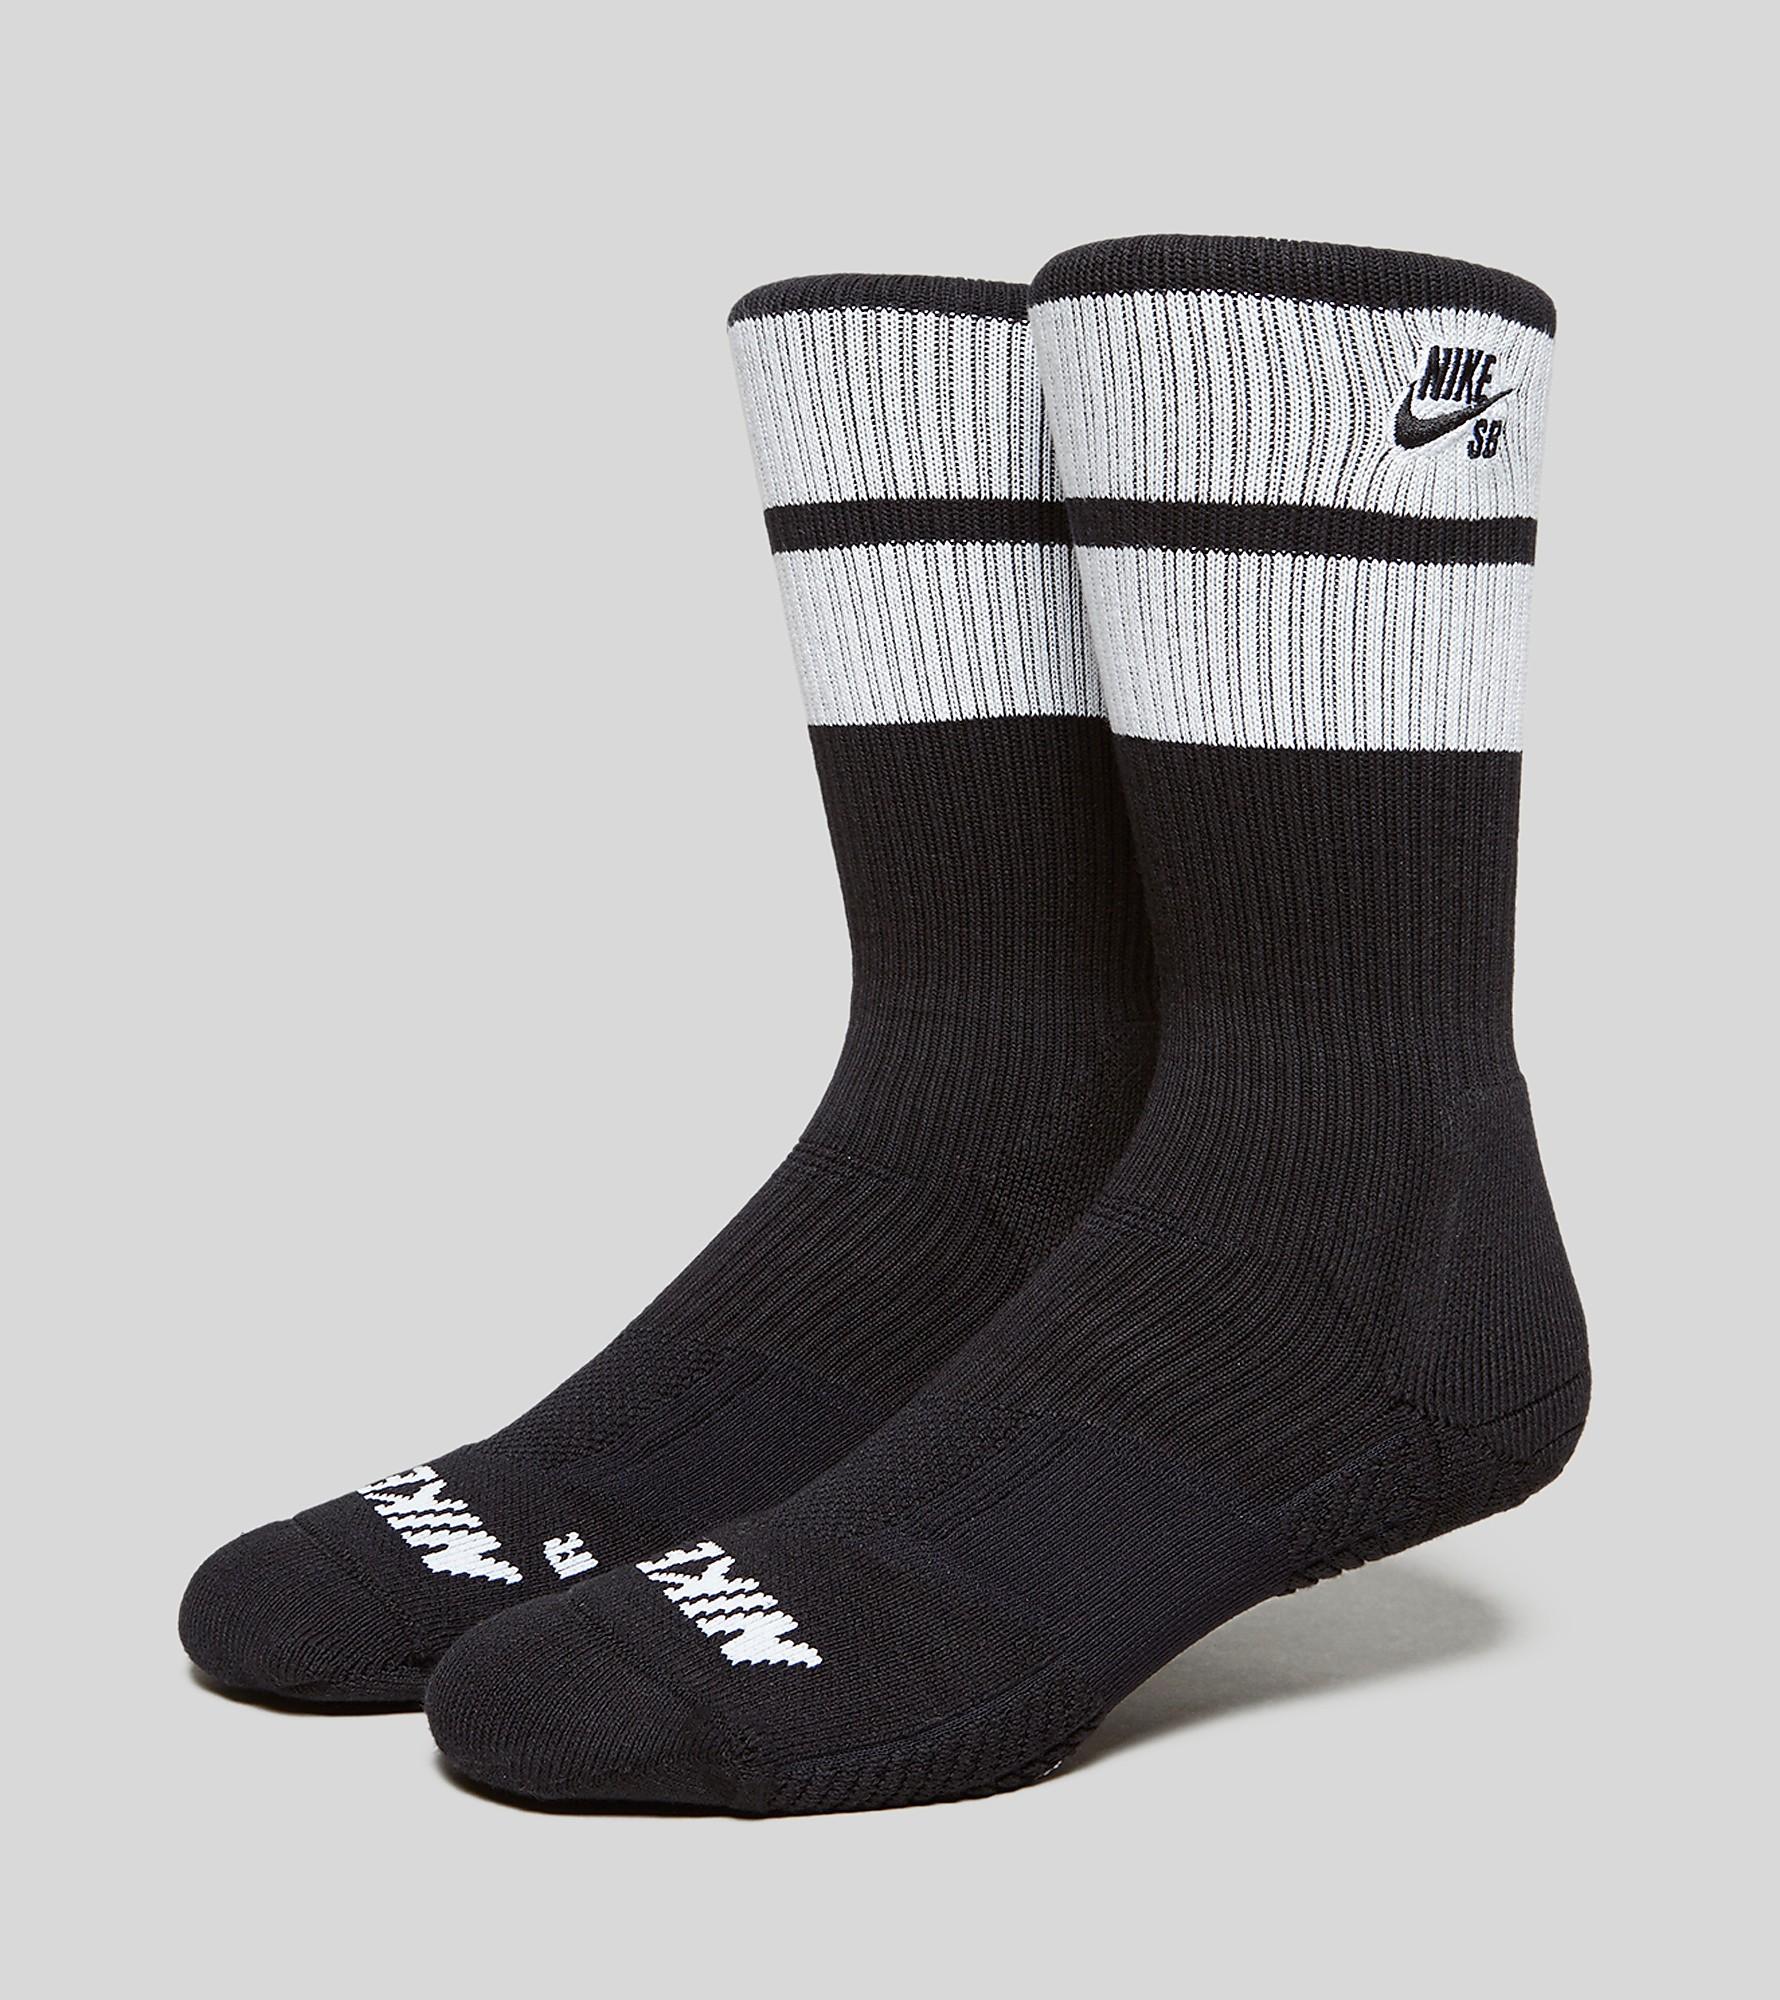 Nike SB Elite Socks